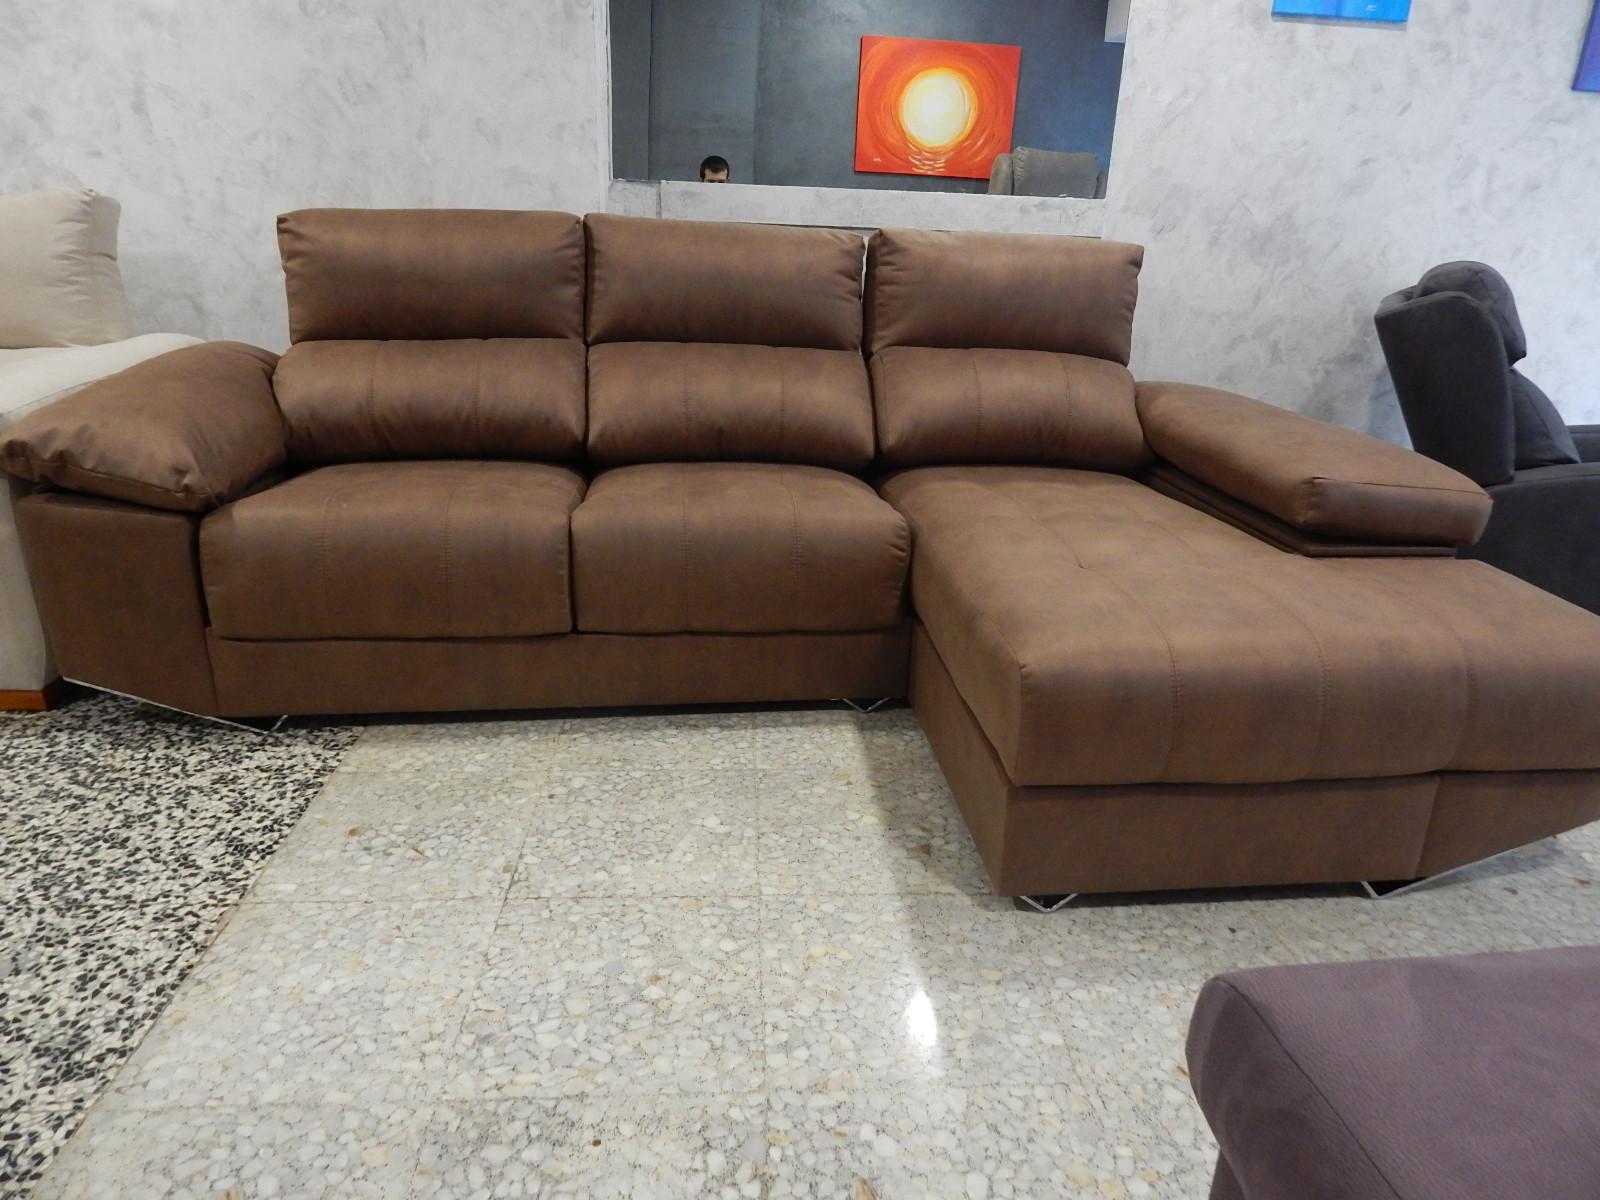 Sofacicos gama gran confort for Sofas gran confort